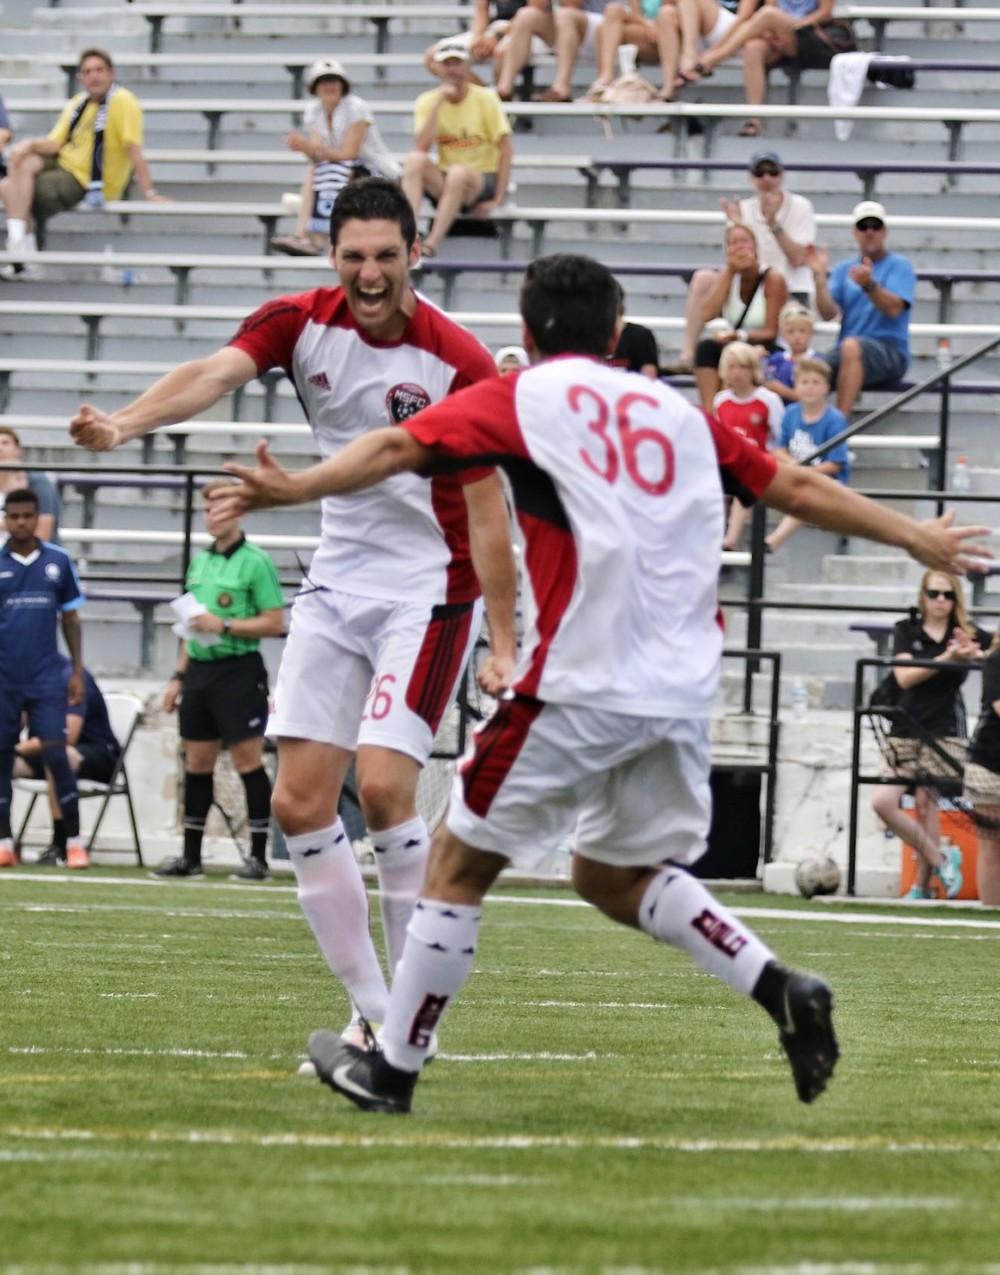 Jon Rubio, Man of the Match and Lone Goal Scorer For Michigan Stars FC 1-1 Tie Photo Credit: Joe Judge